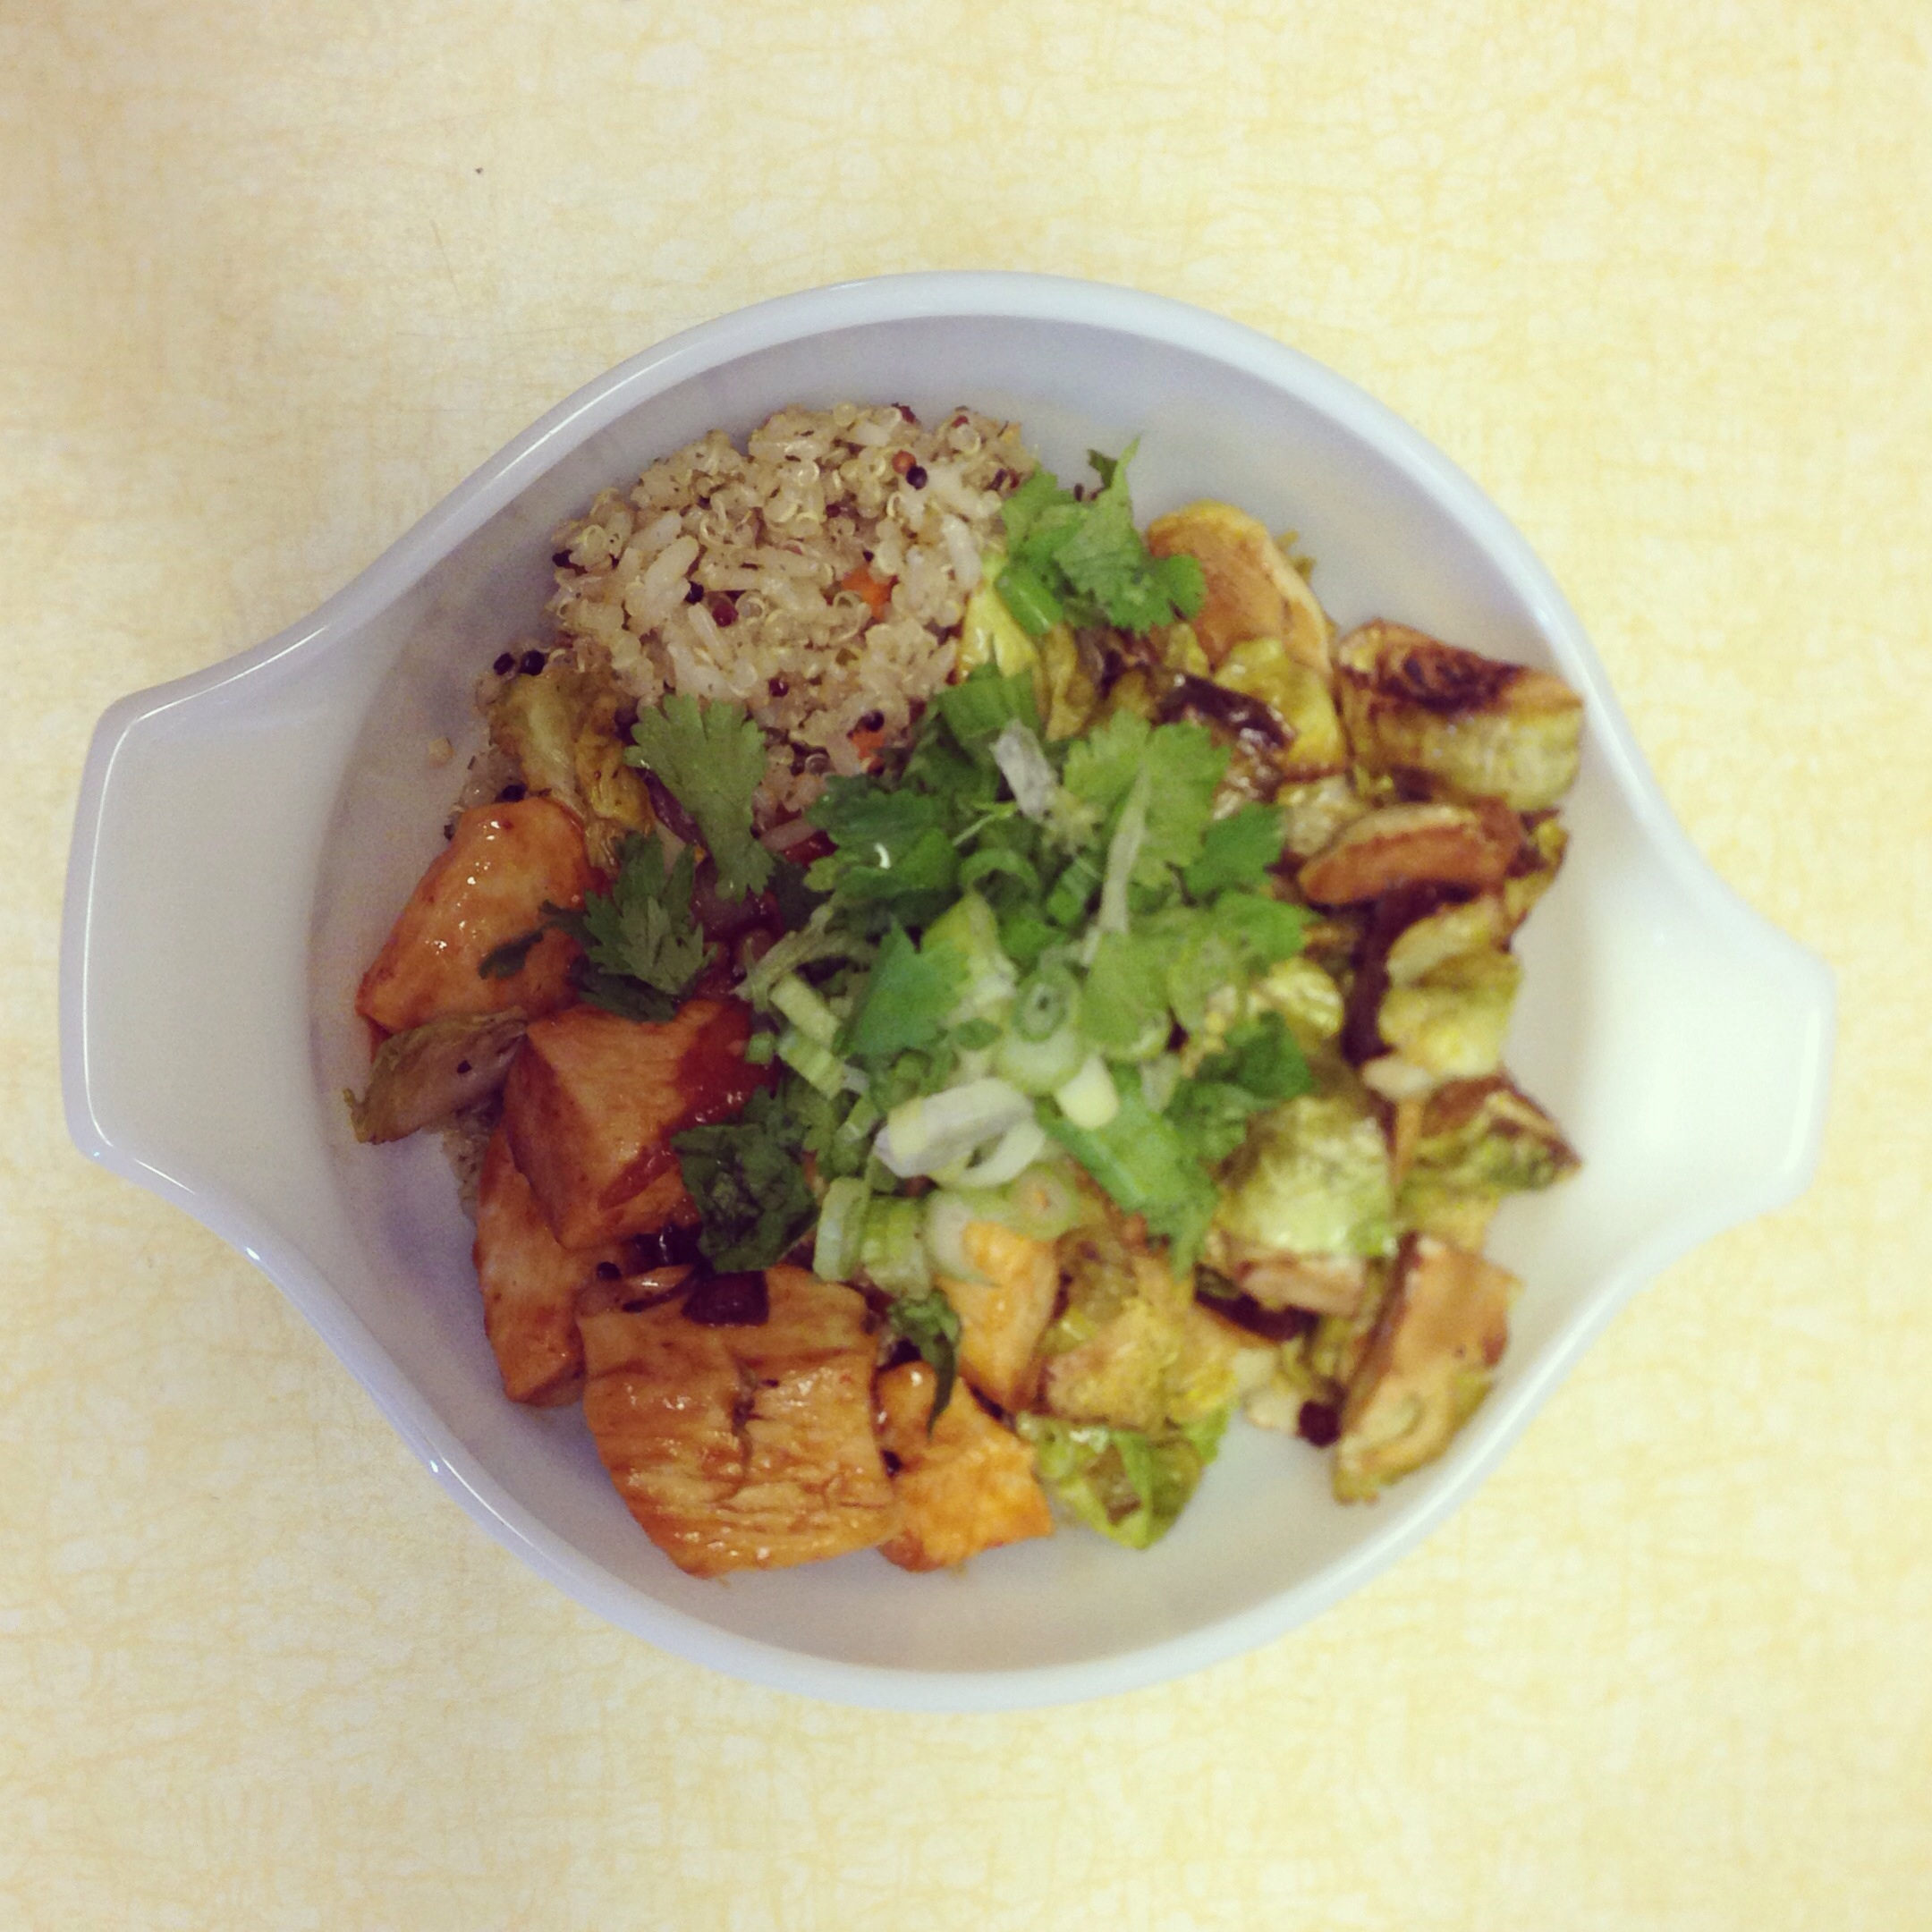 Siracha chicken with quinoa